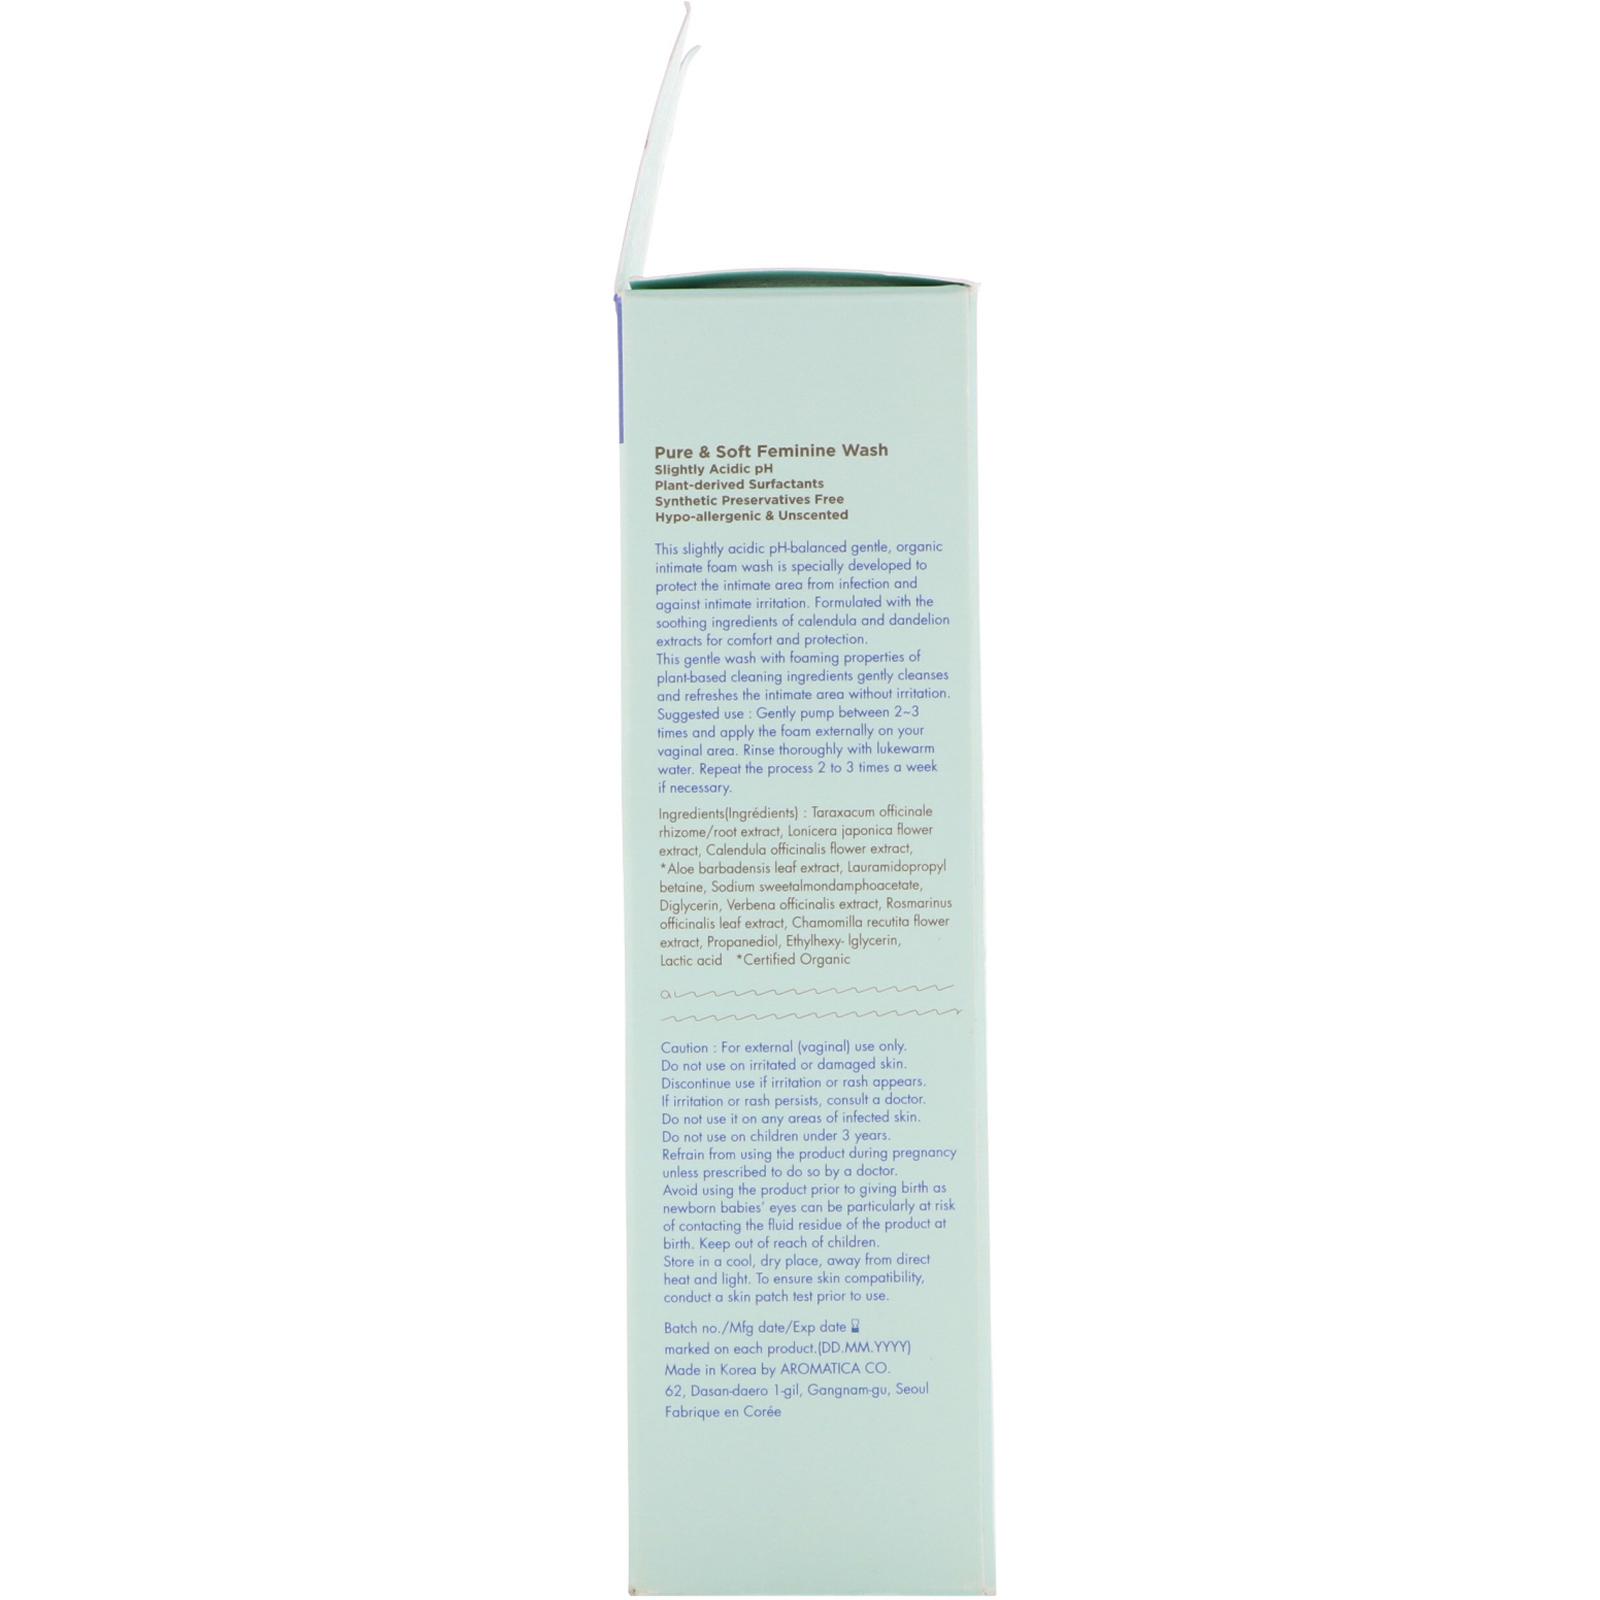 Aromatica Pure Soft Feminine Wash 5 7 Fl Oz 170 Ml Iherb